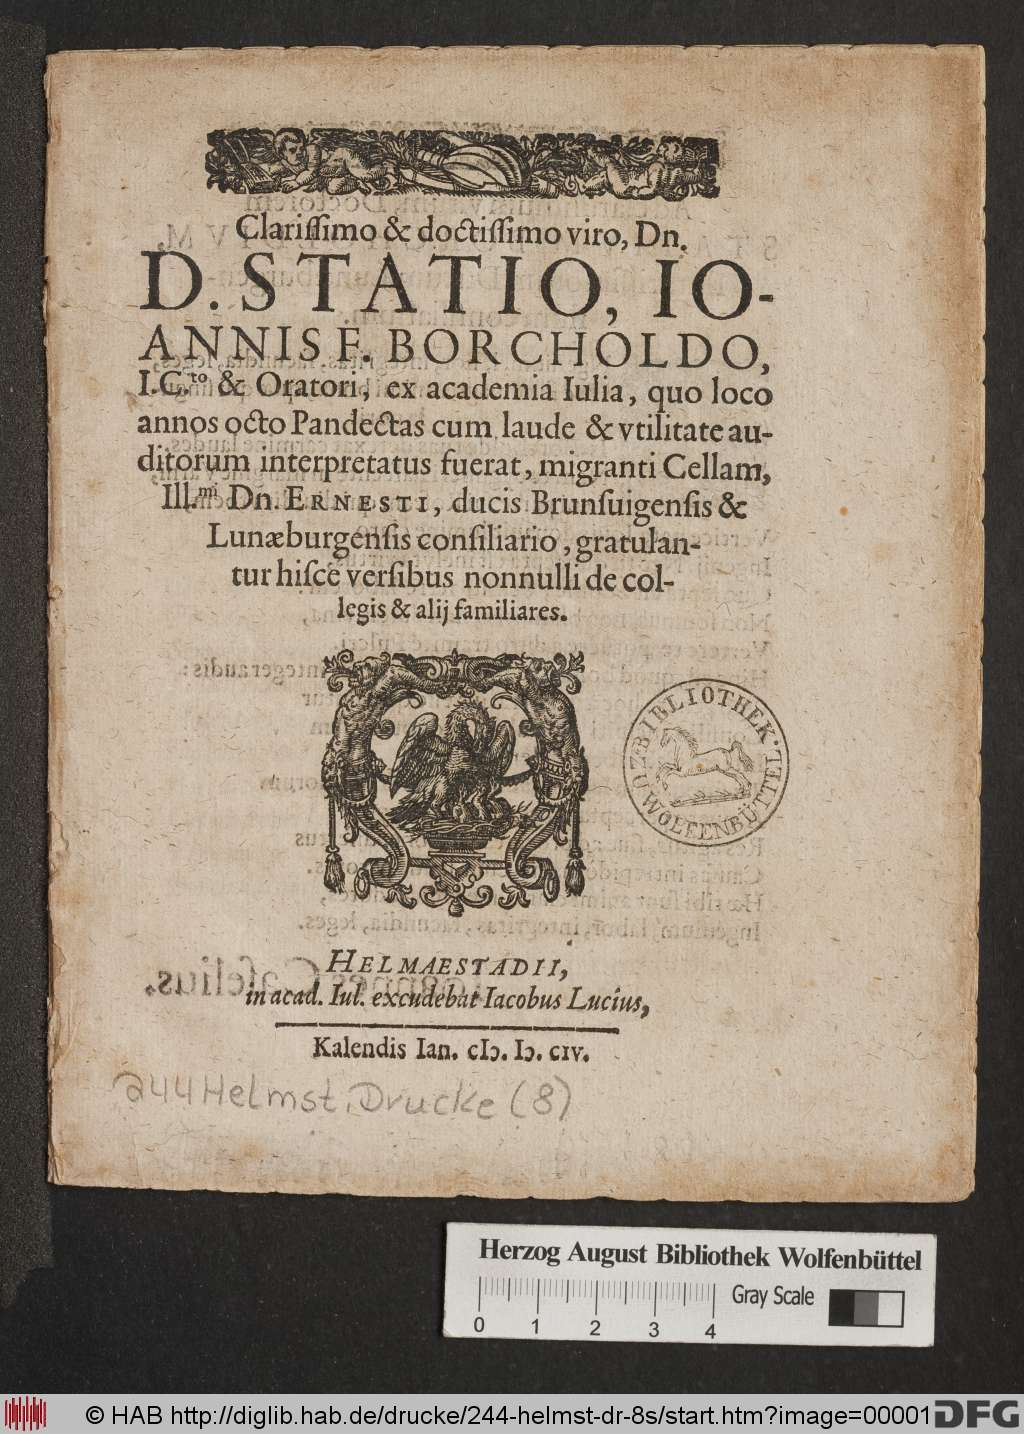 http://diglib.hab.de/drucke/244-helmst-dr-8s/00001.jpg